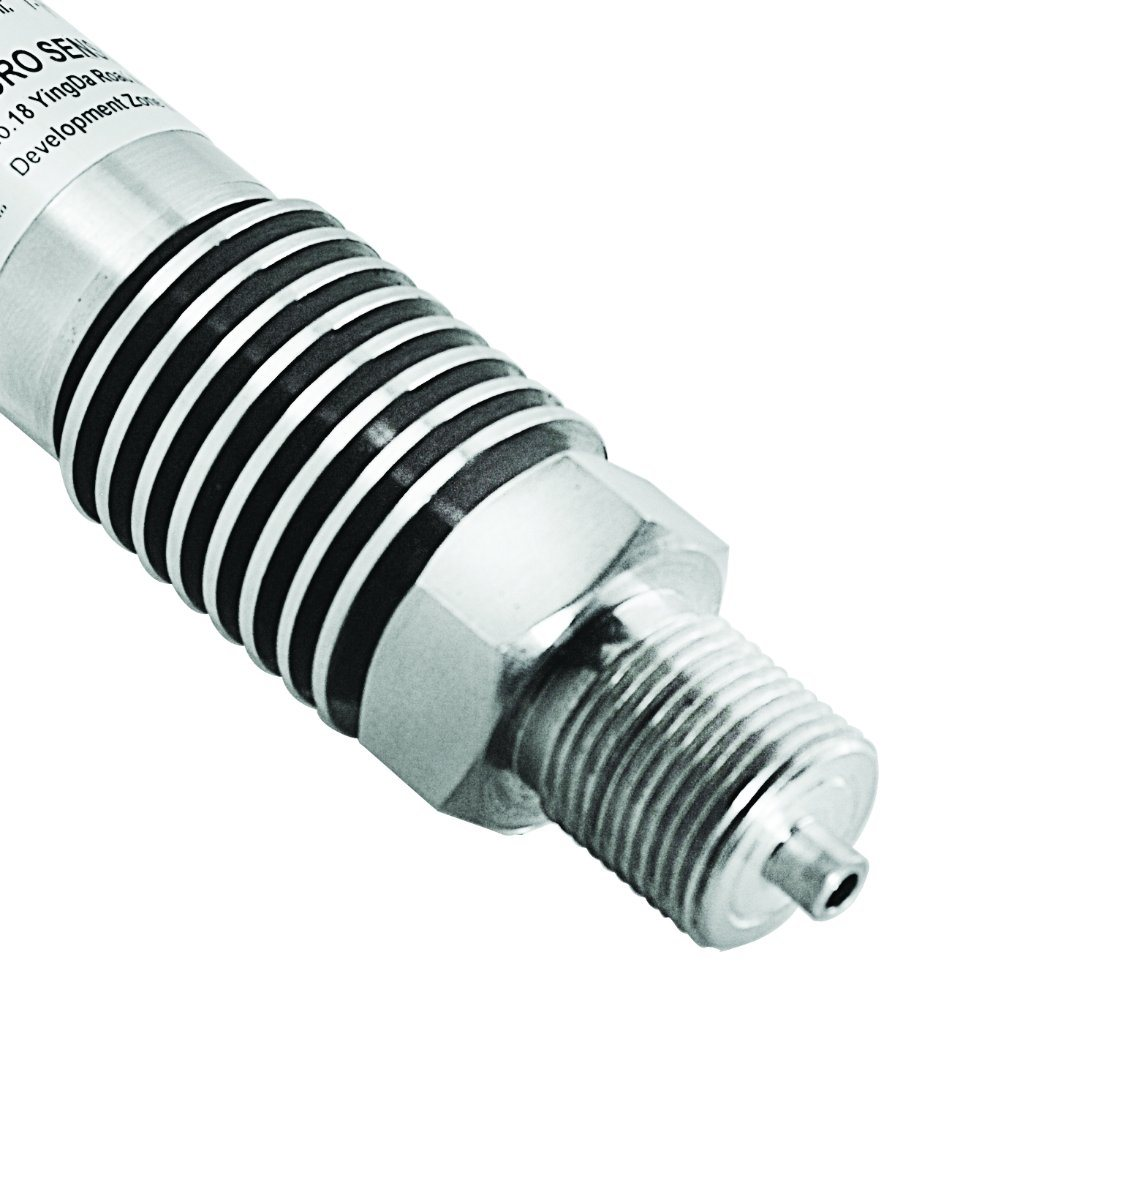 up to 150c Media Temperature Pressure Transmitter (MPM4530)